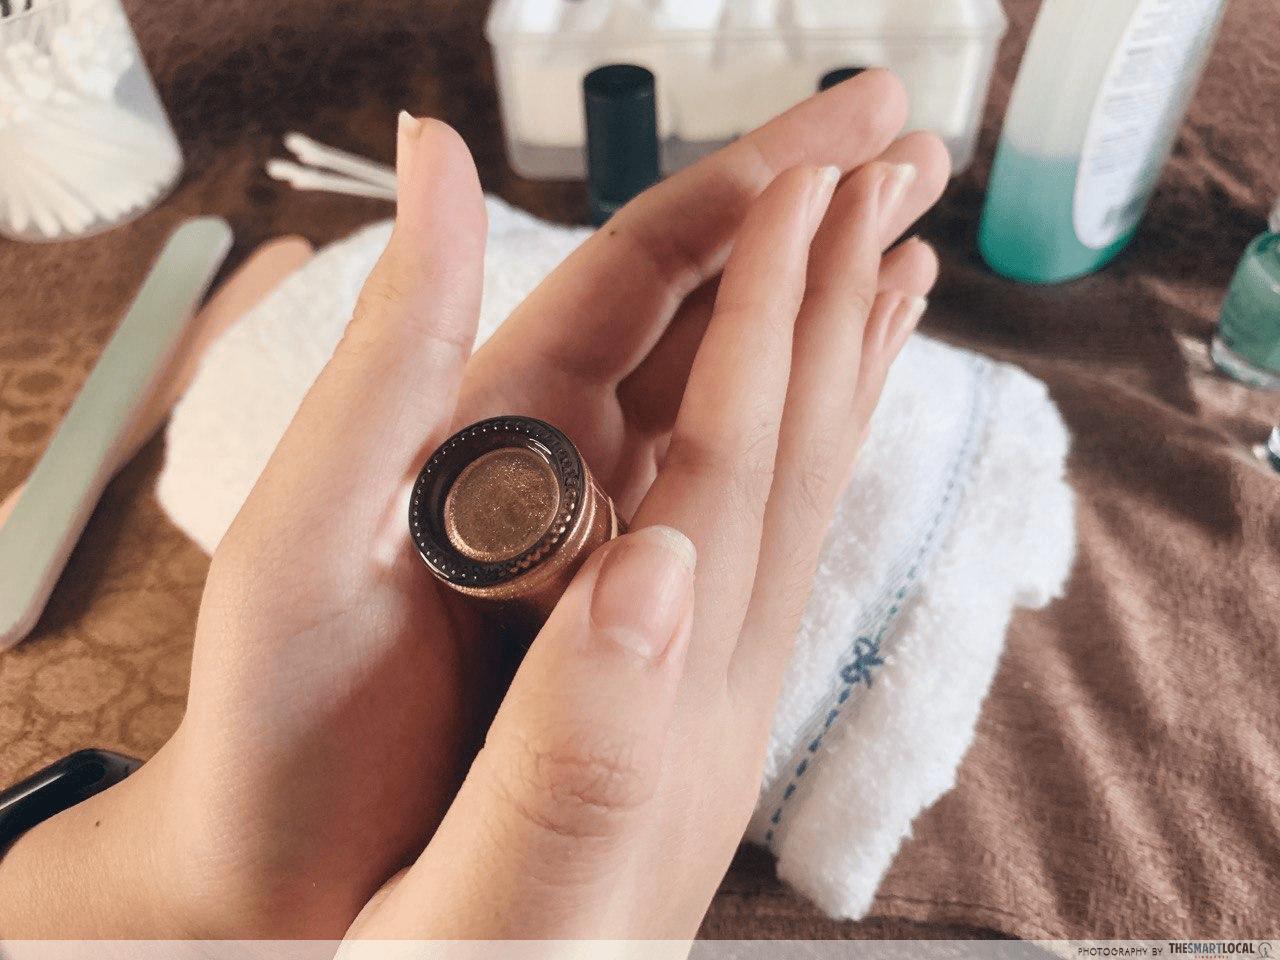 Nails - rolling bottle